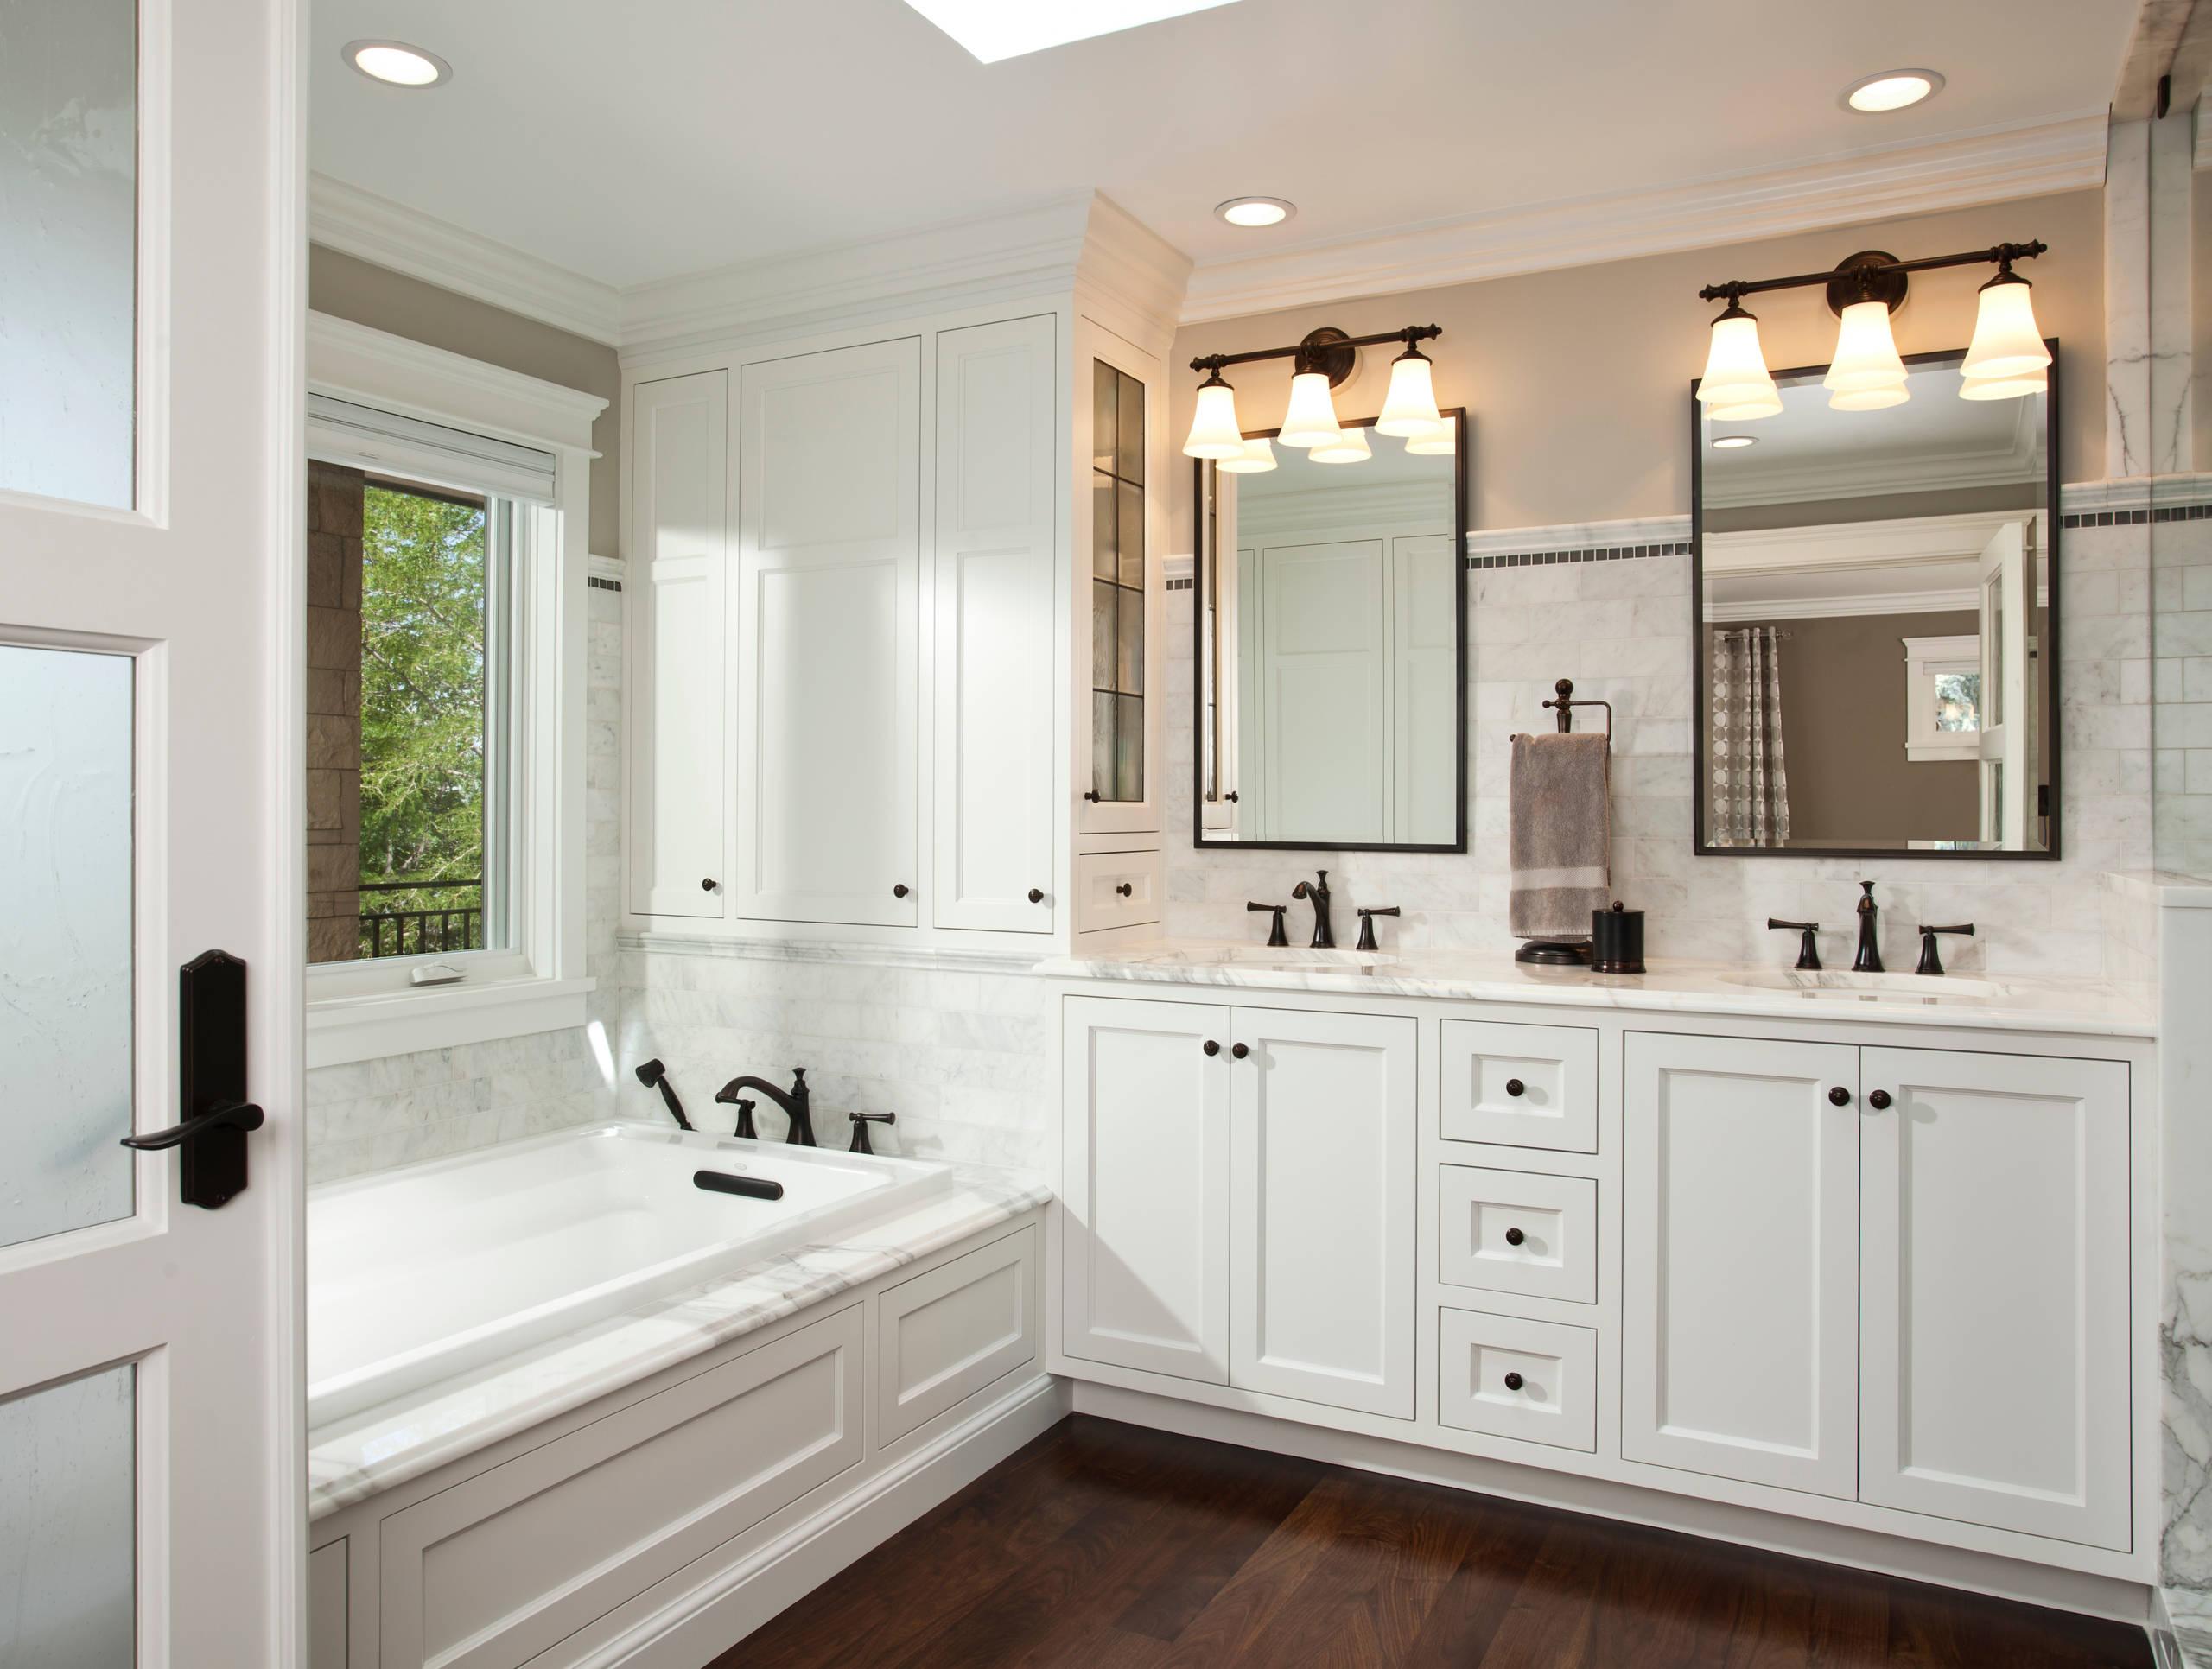 75 Beautiful Dark Wood Floor Bathroom Pictures Ideas February 2021 Houzz